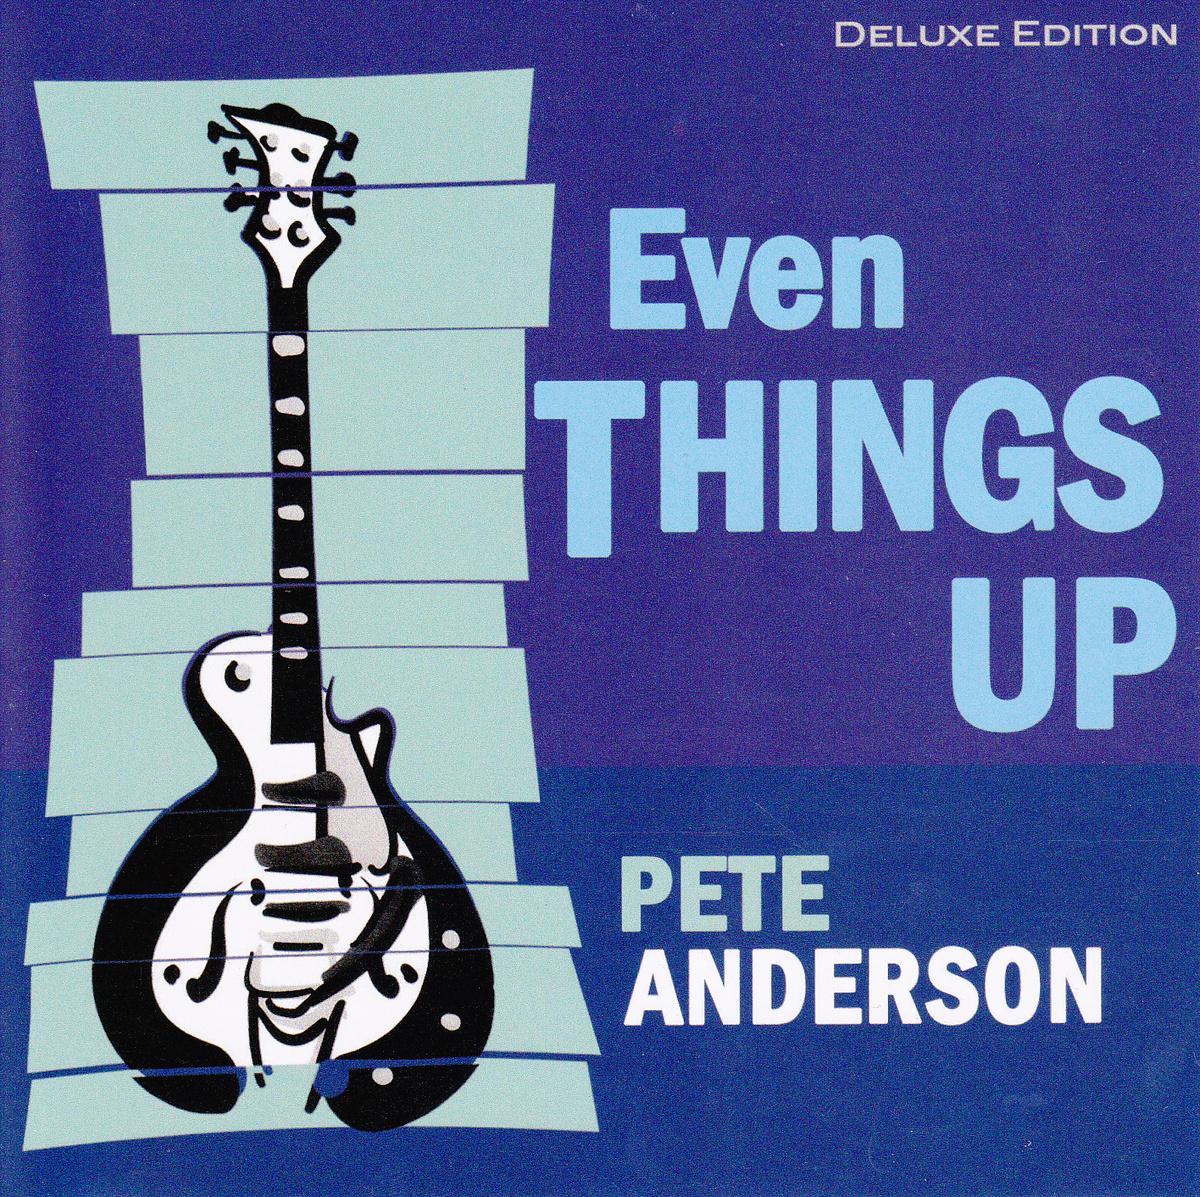 Pete Anderson